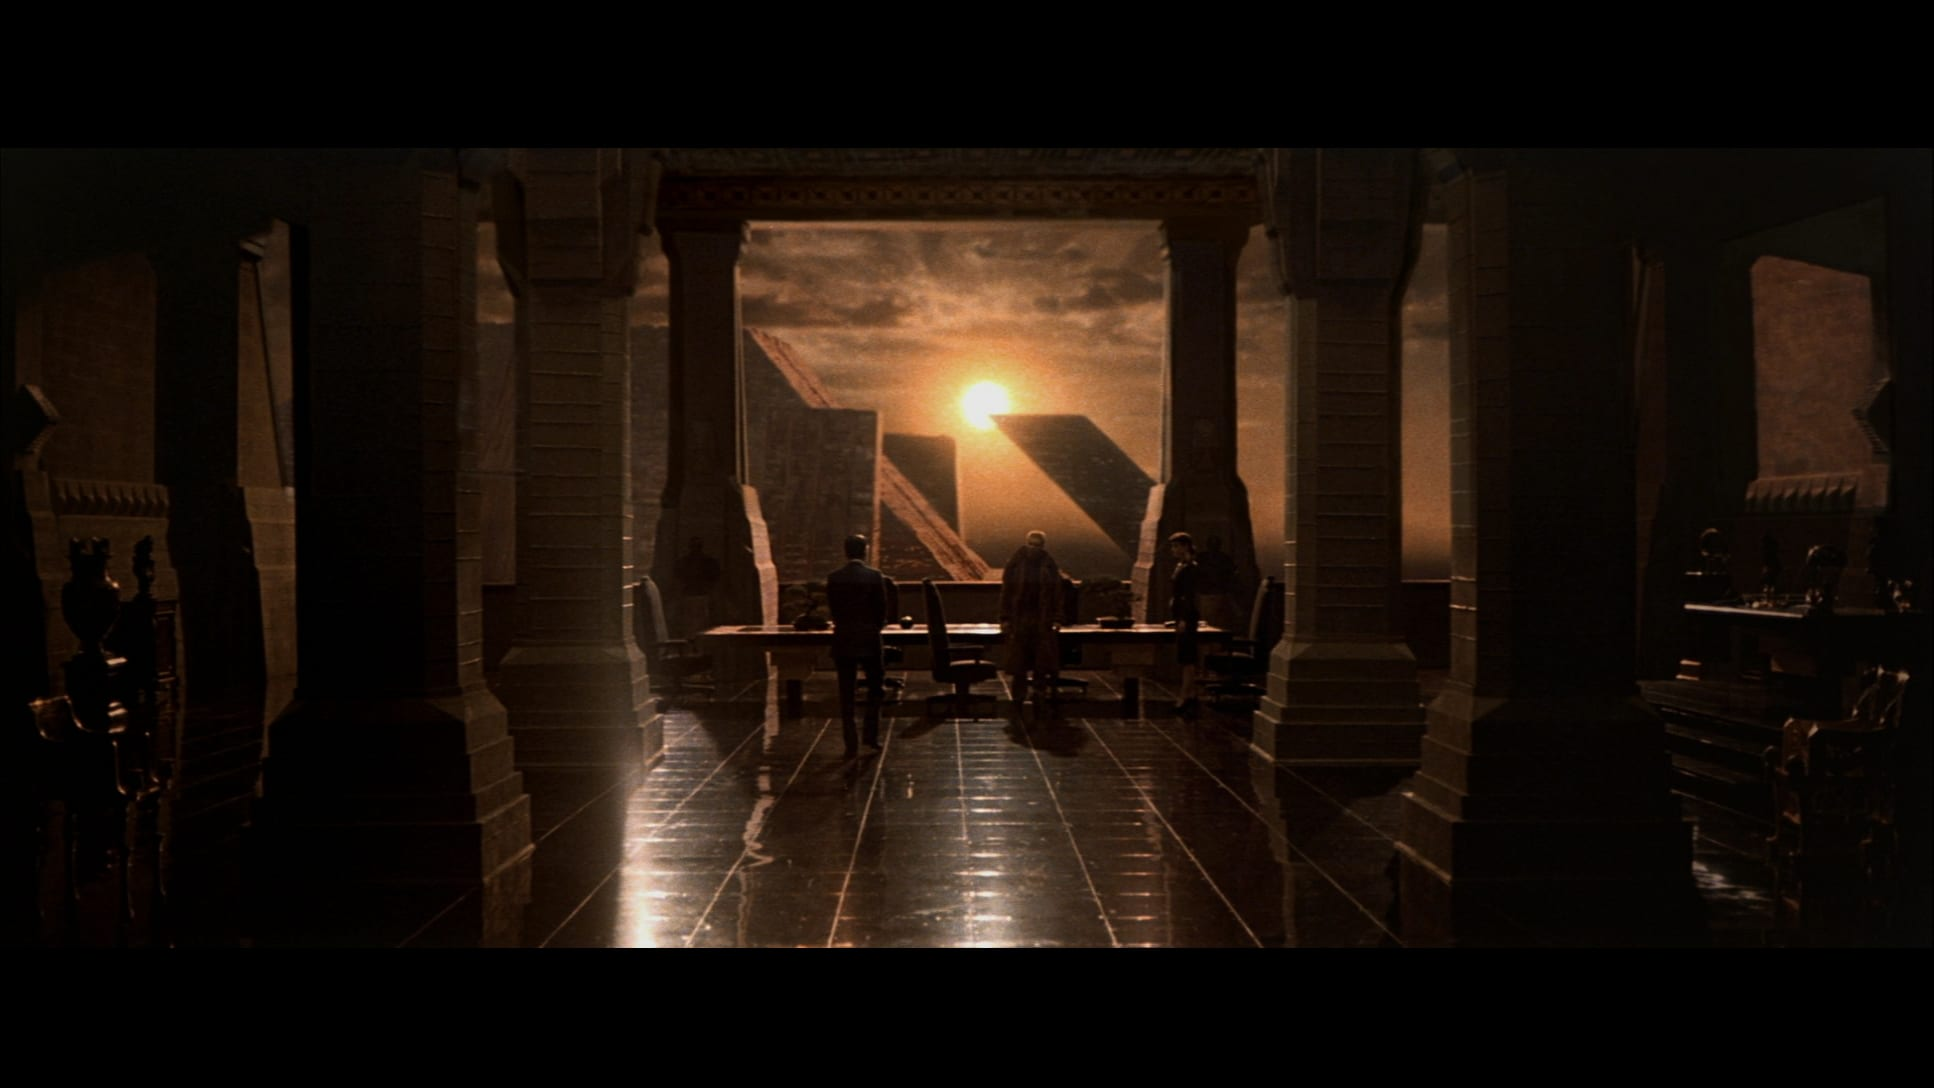 Blade Runner - Director's Cut - Capture Blu-ray